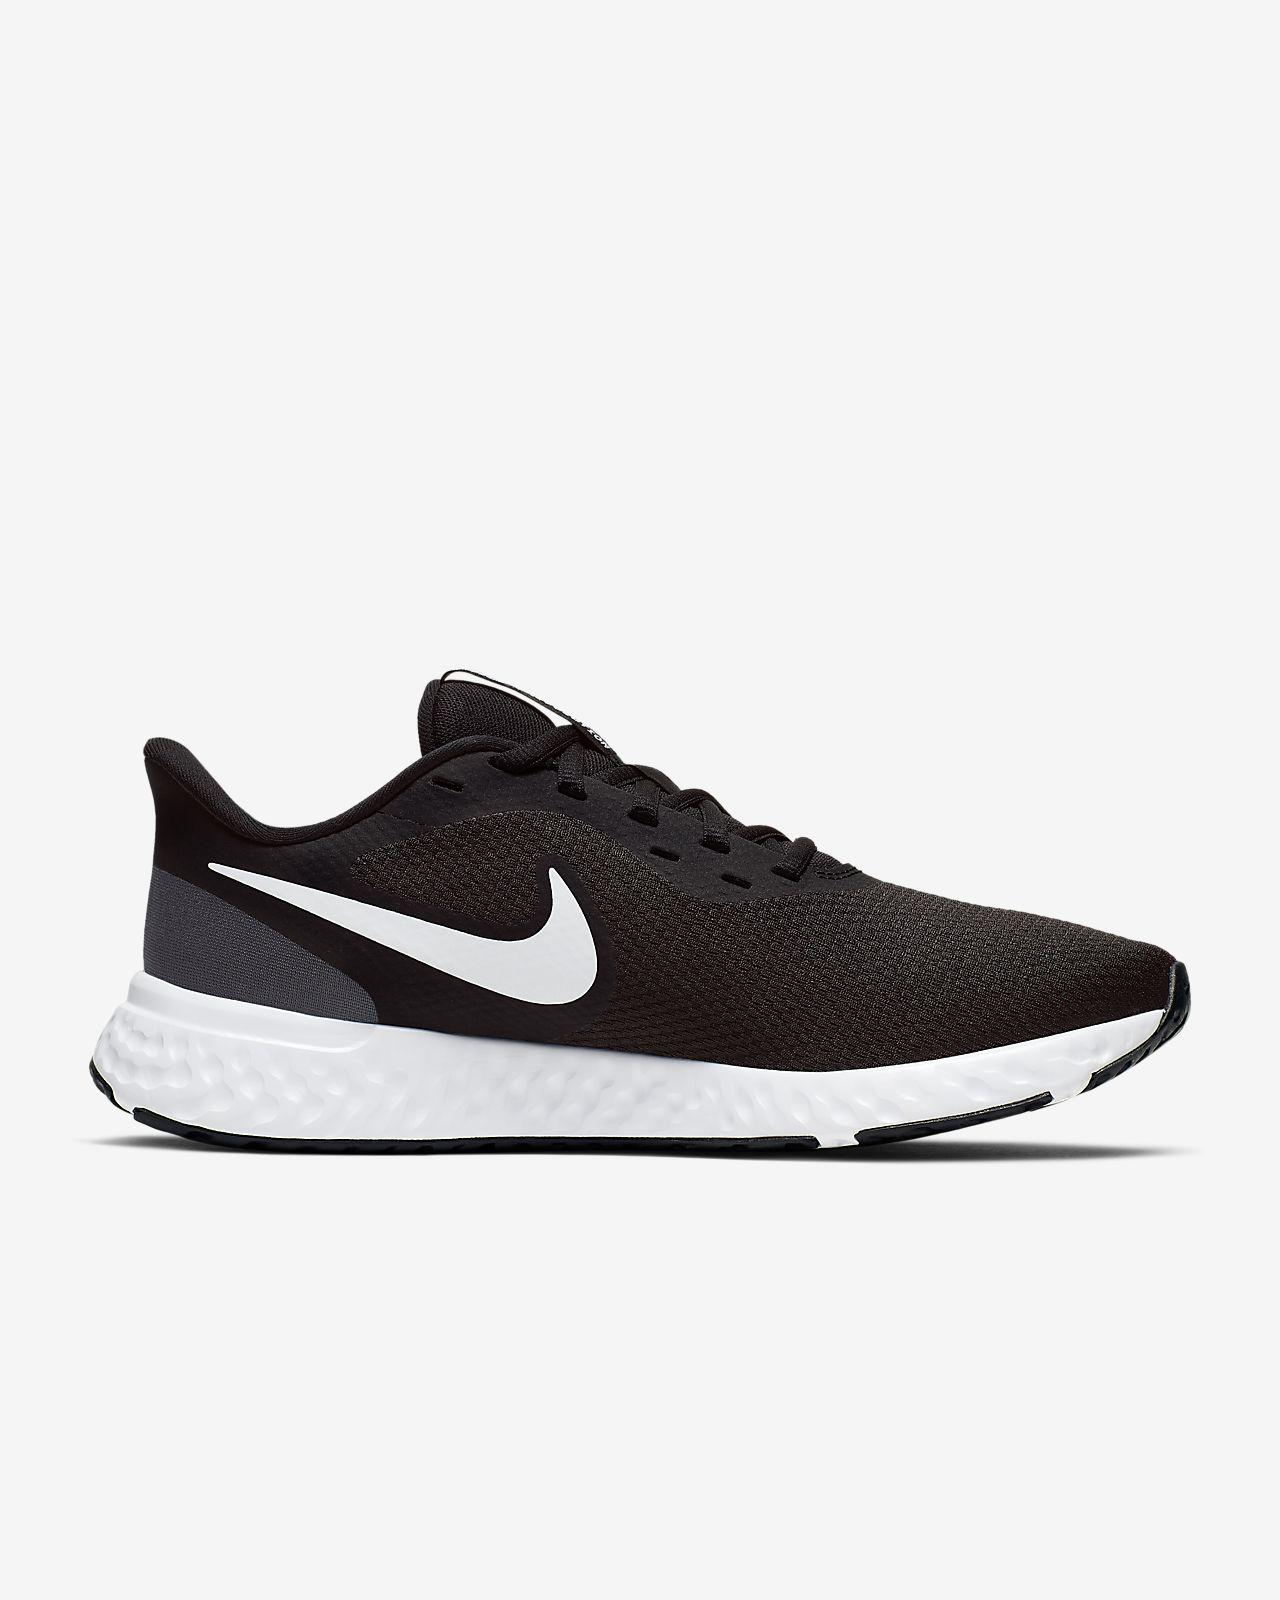 de running 5 pour Chaussure Revolution Nike Femme Iyf7gb6Yv